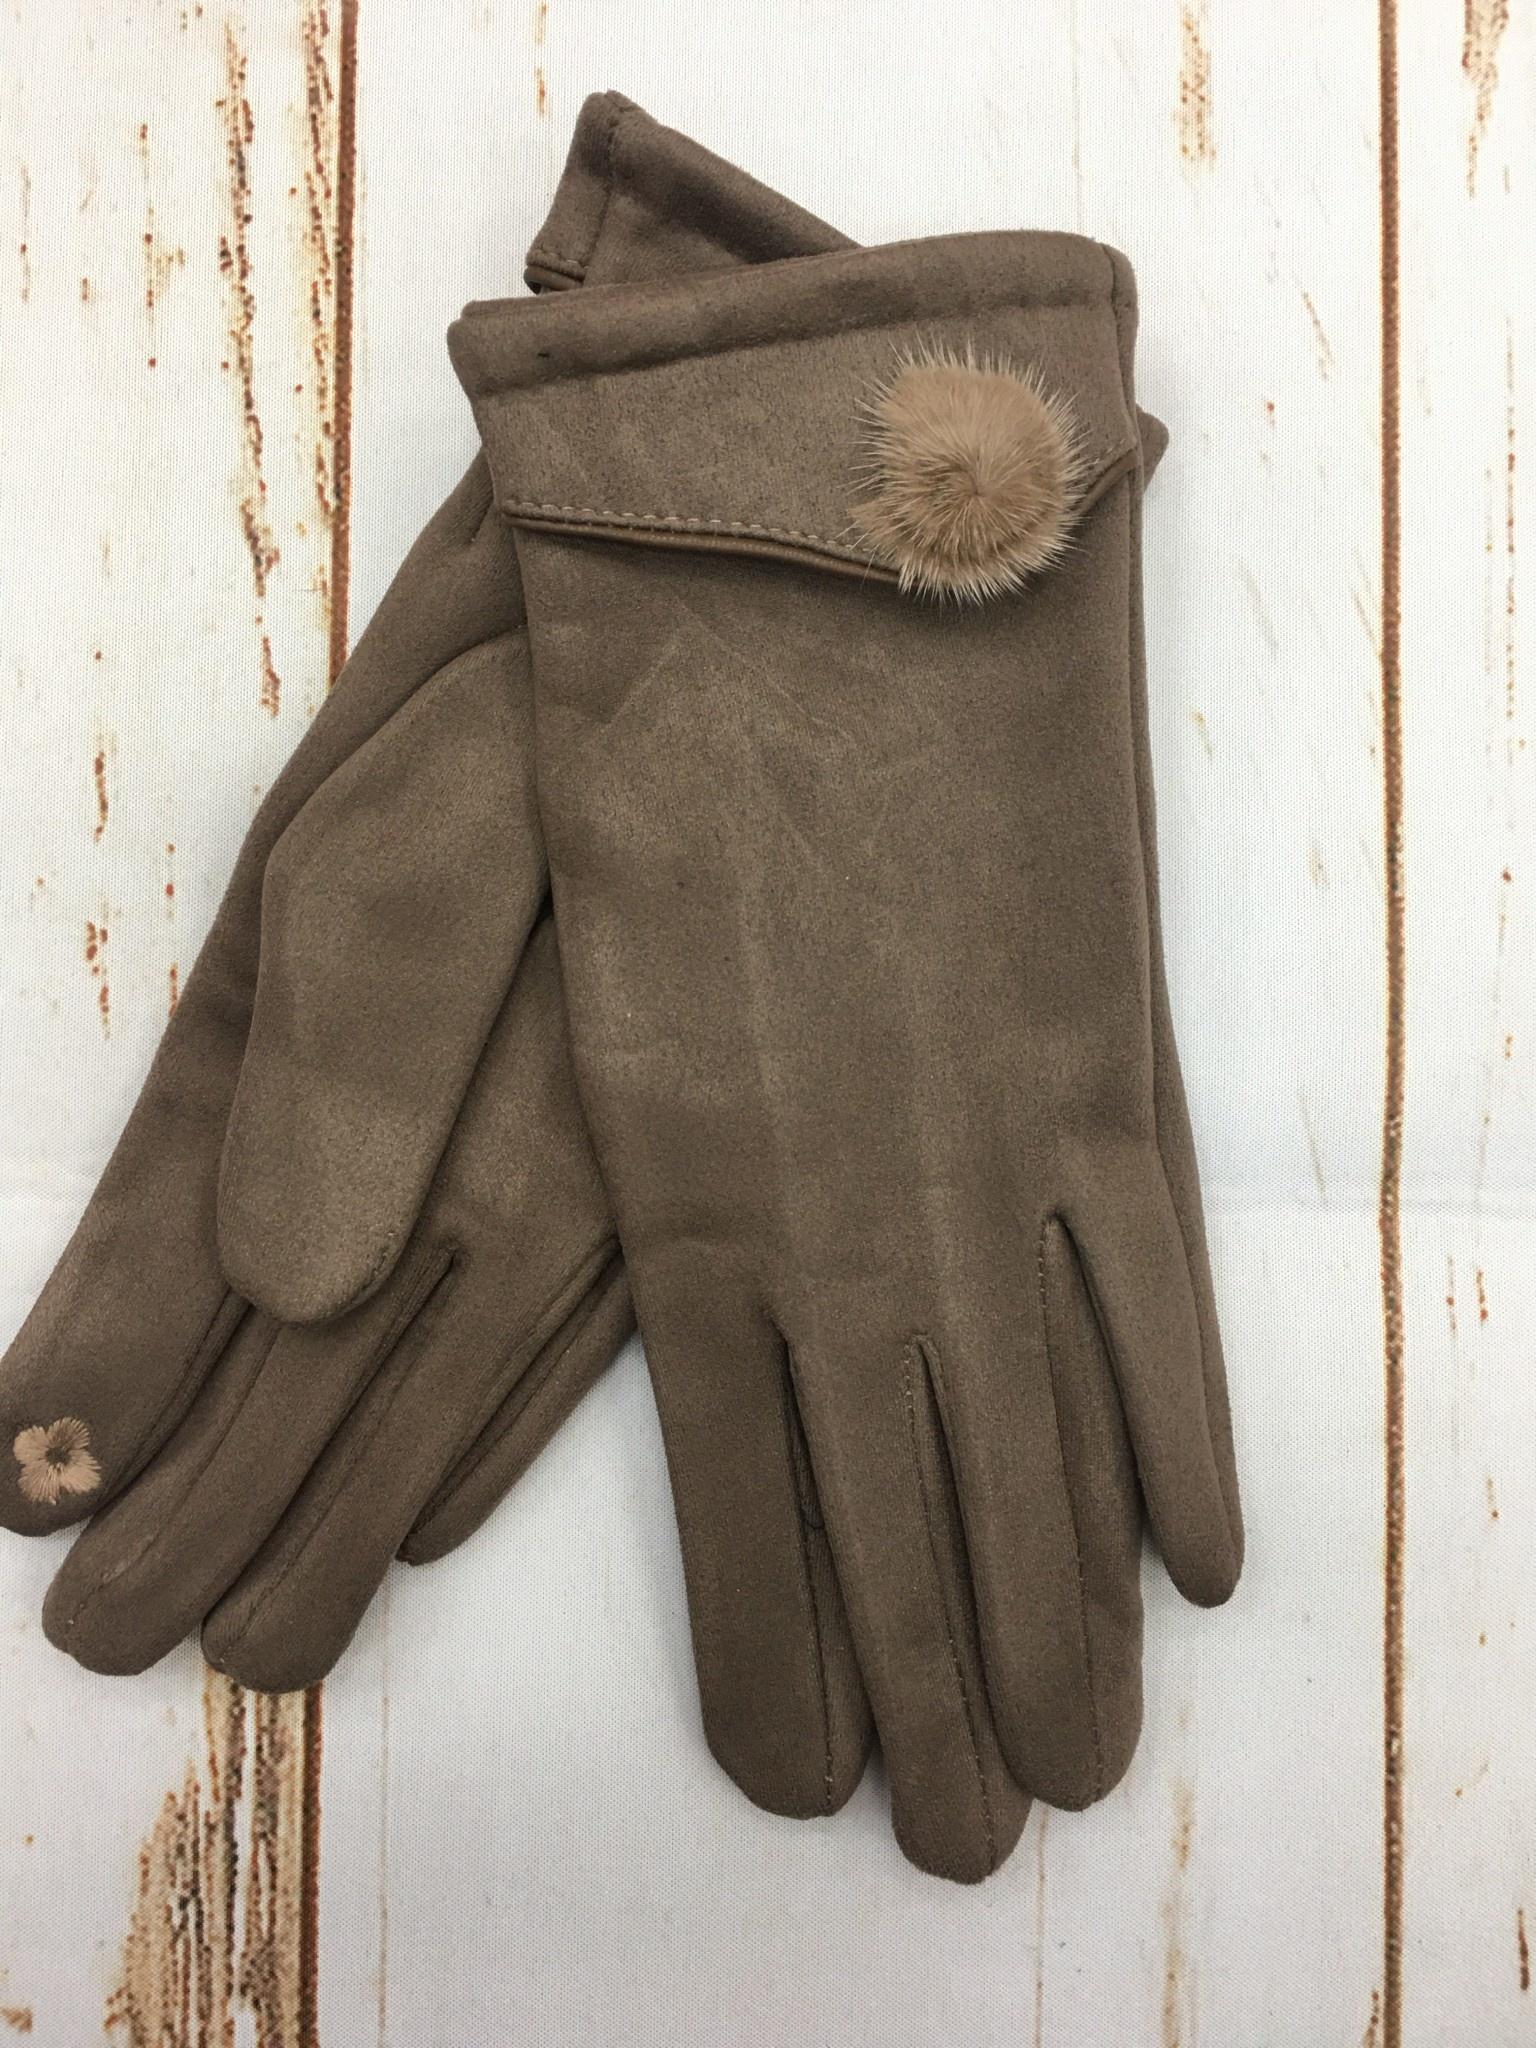 Top It Off Suede Glove W/Pom in Tan